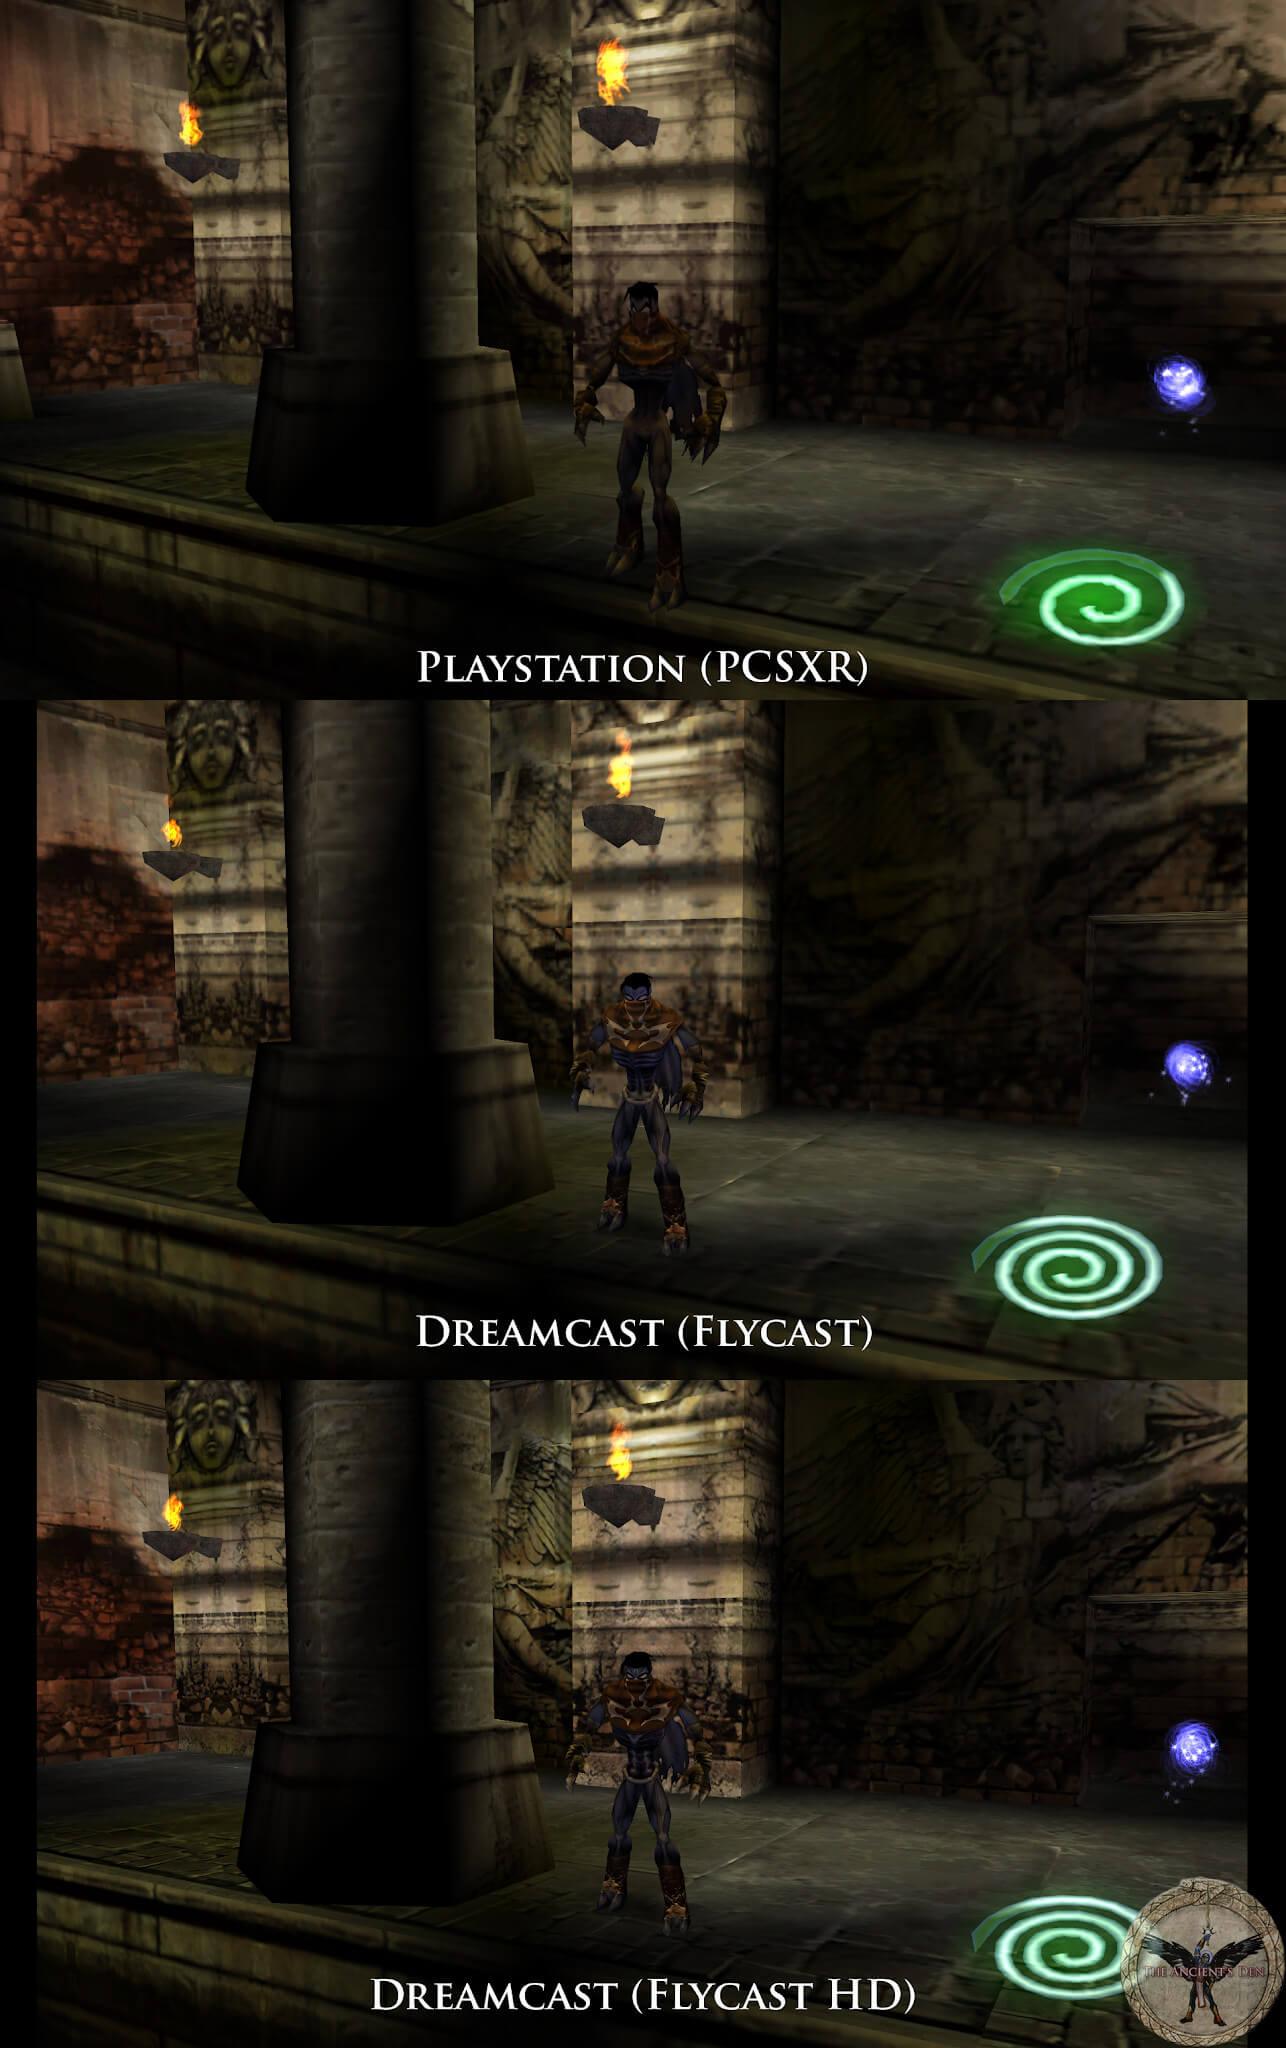 Вышел мод HD Remaster с помощью ИИ для Legacy of Kain: Soul Reaver